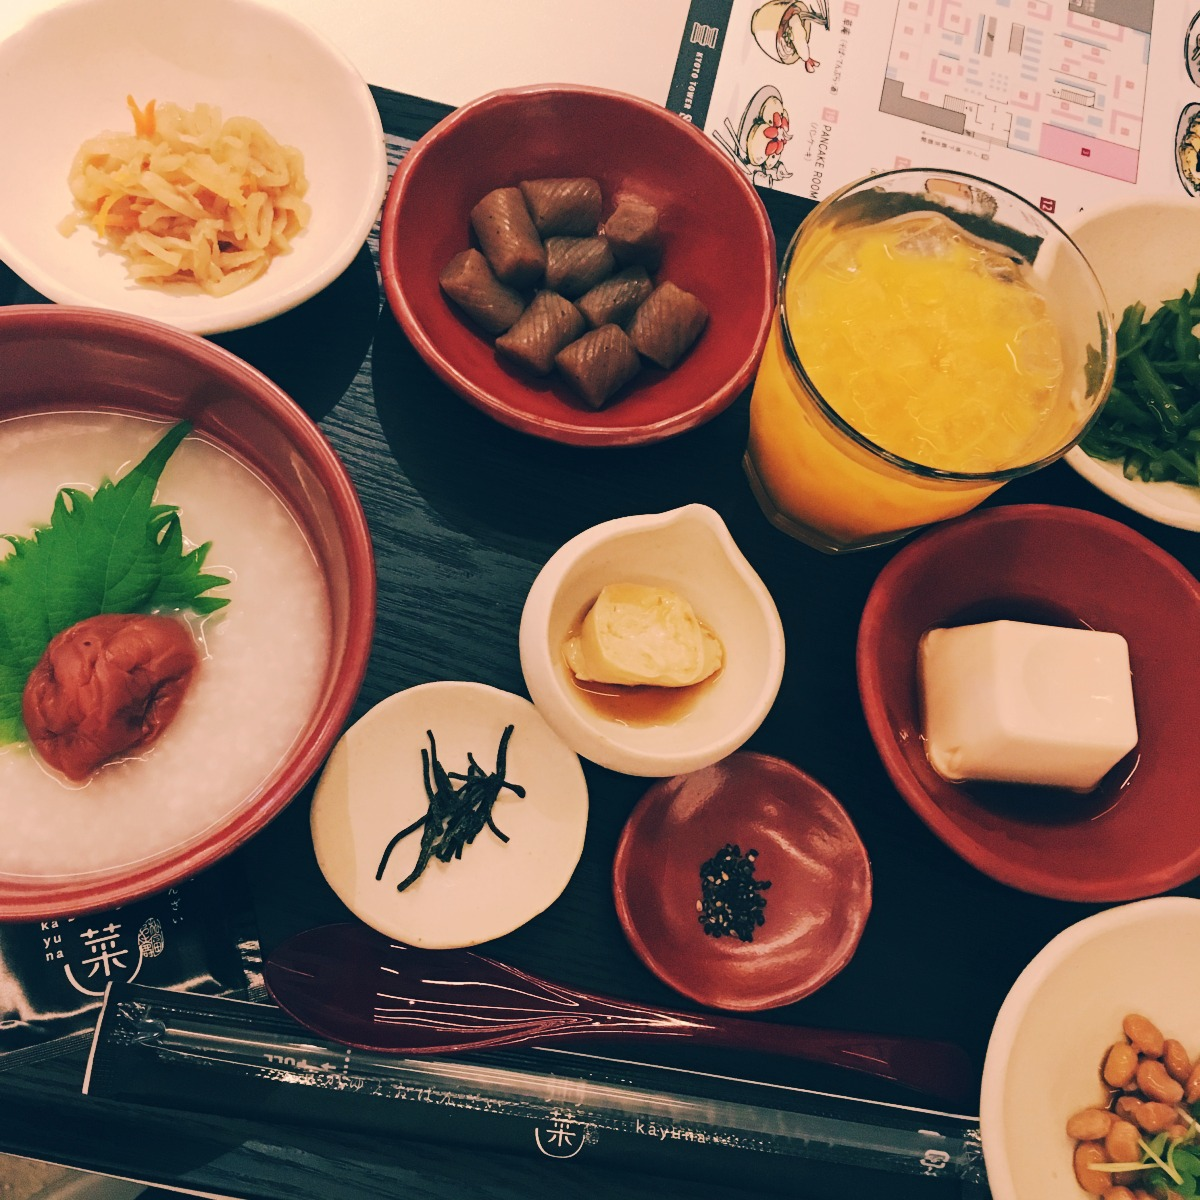 京都最後の晩餐